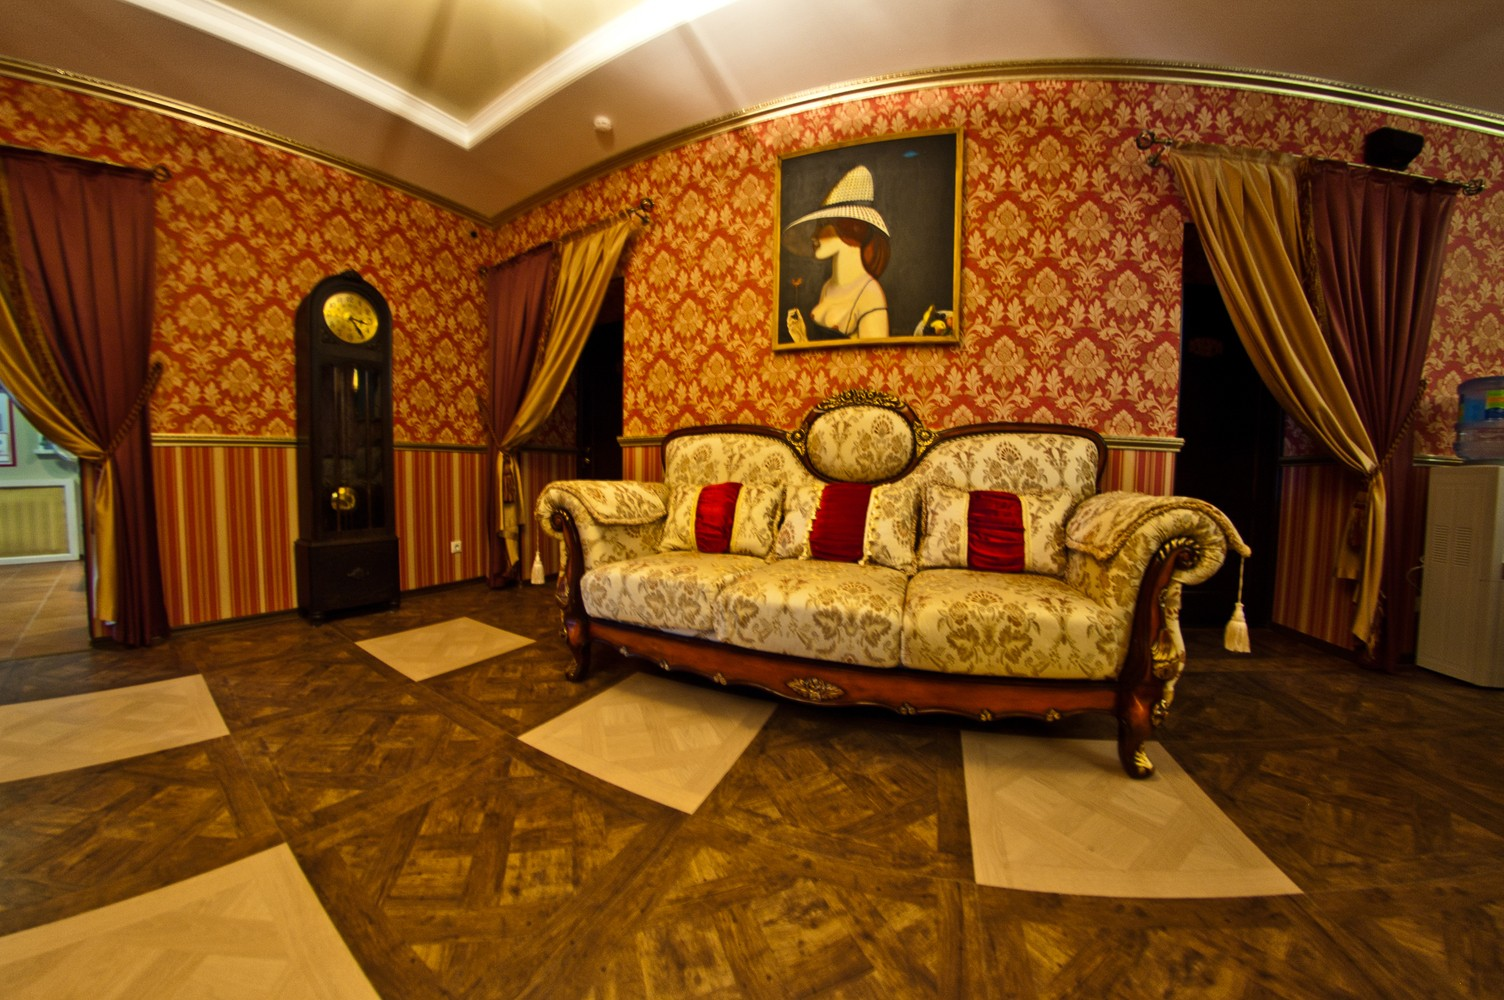 Москвич, гостевой дом - №30